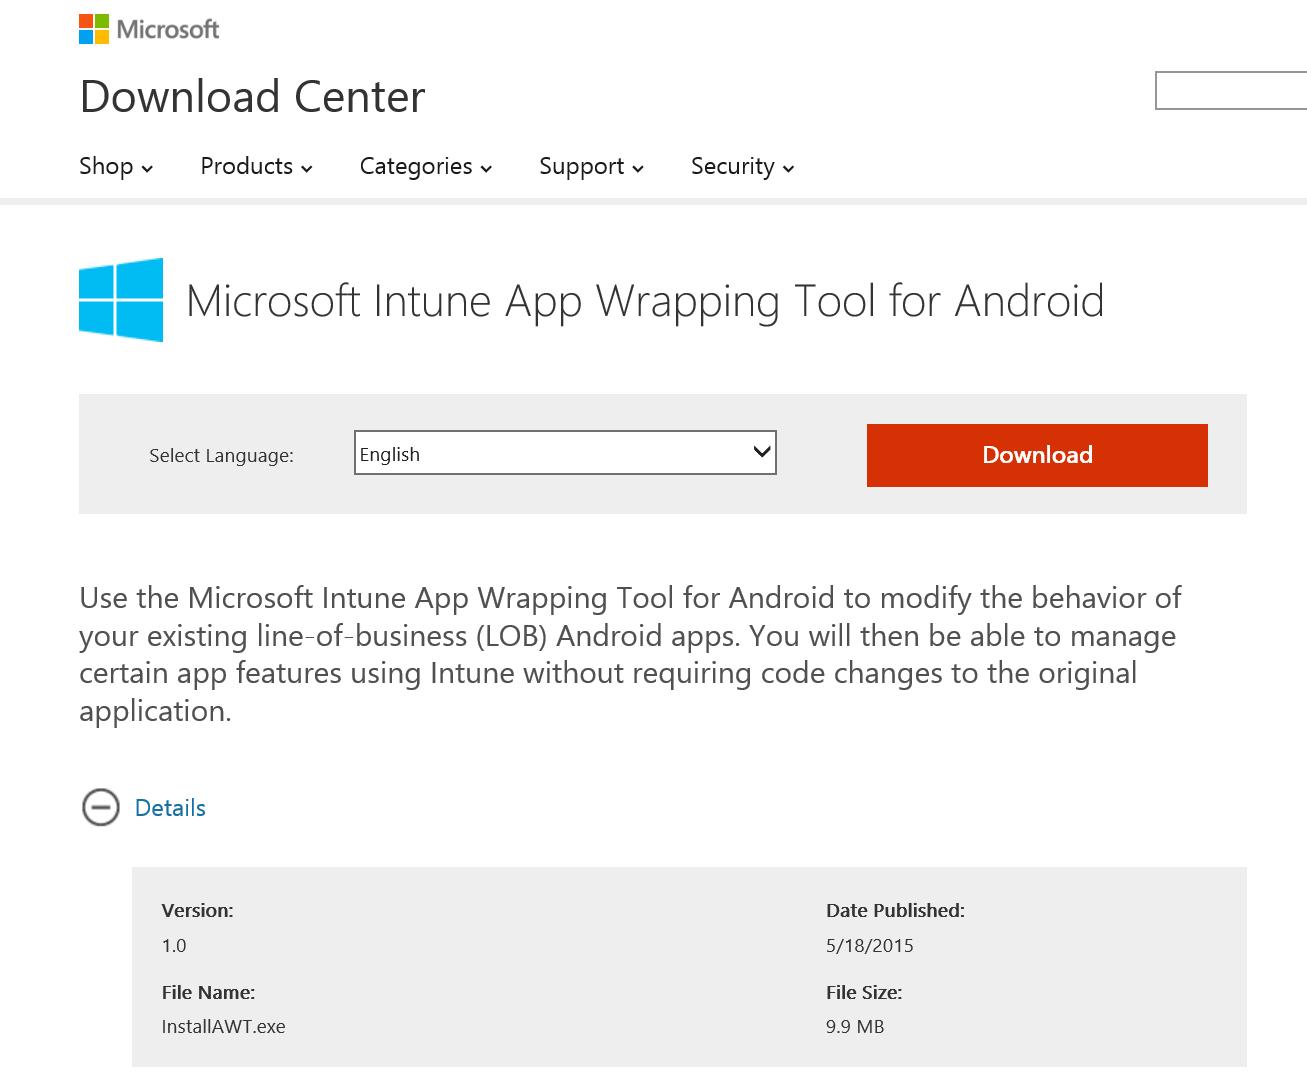 Microsoft Intune App